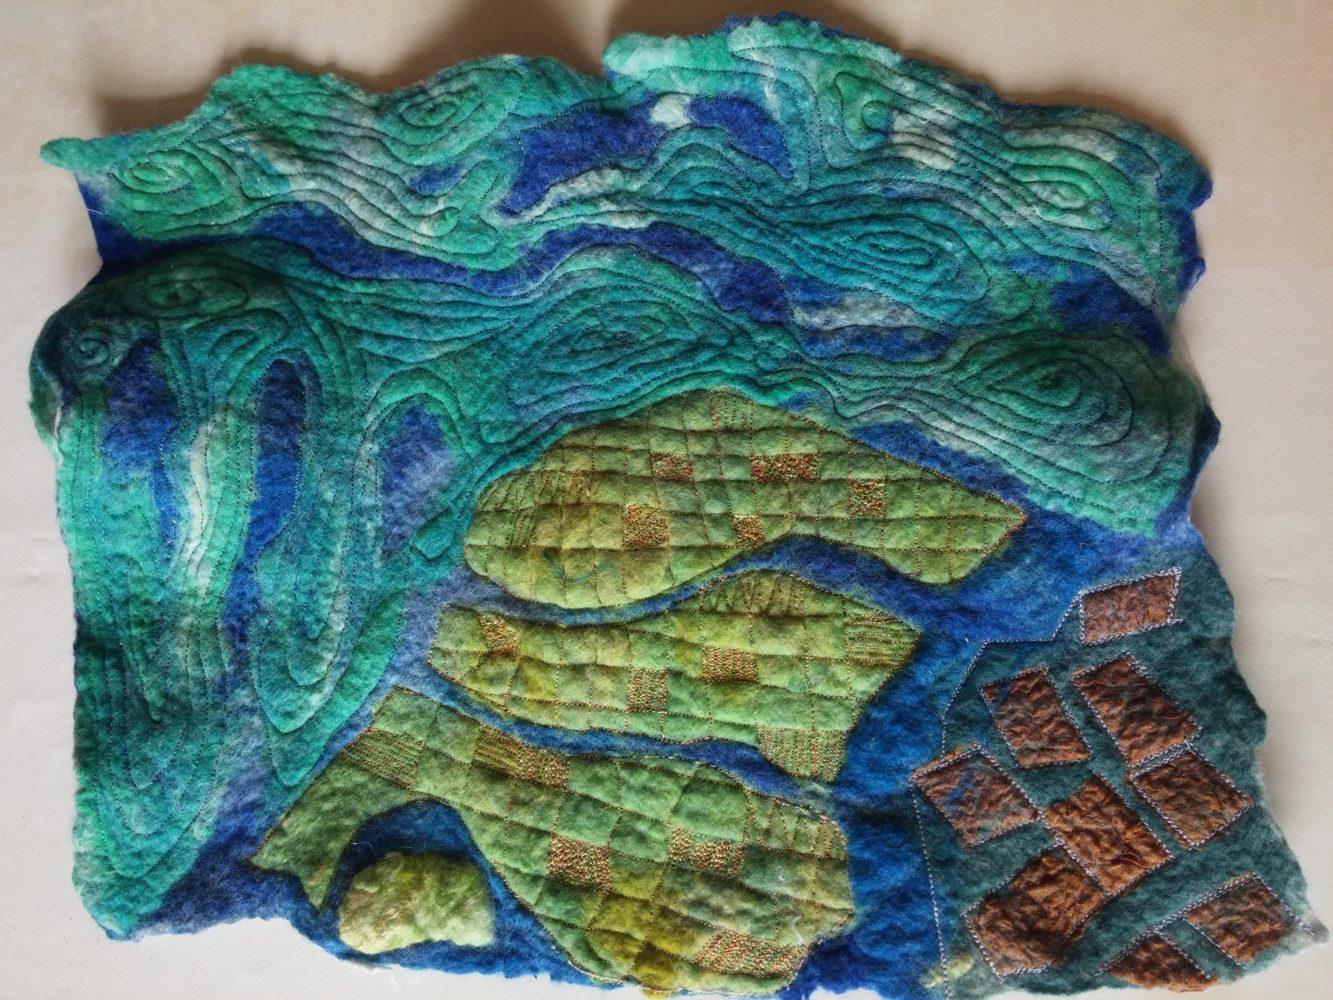 venice lagoon felt art handmade blythwhimsies 2016-04-10 11.43.57